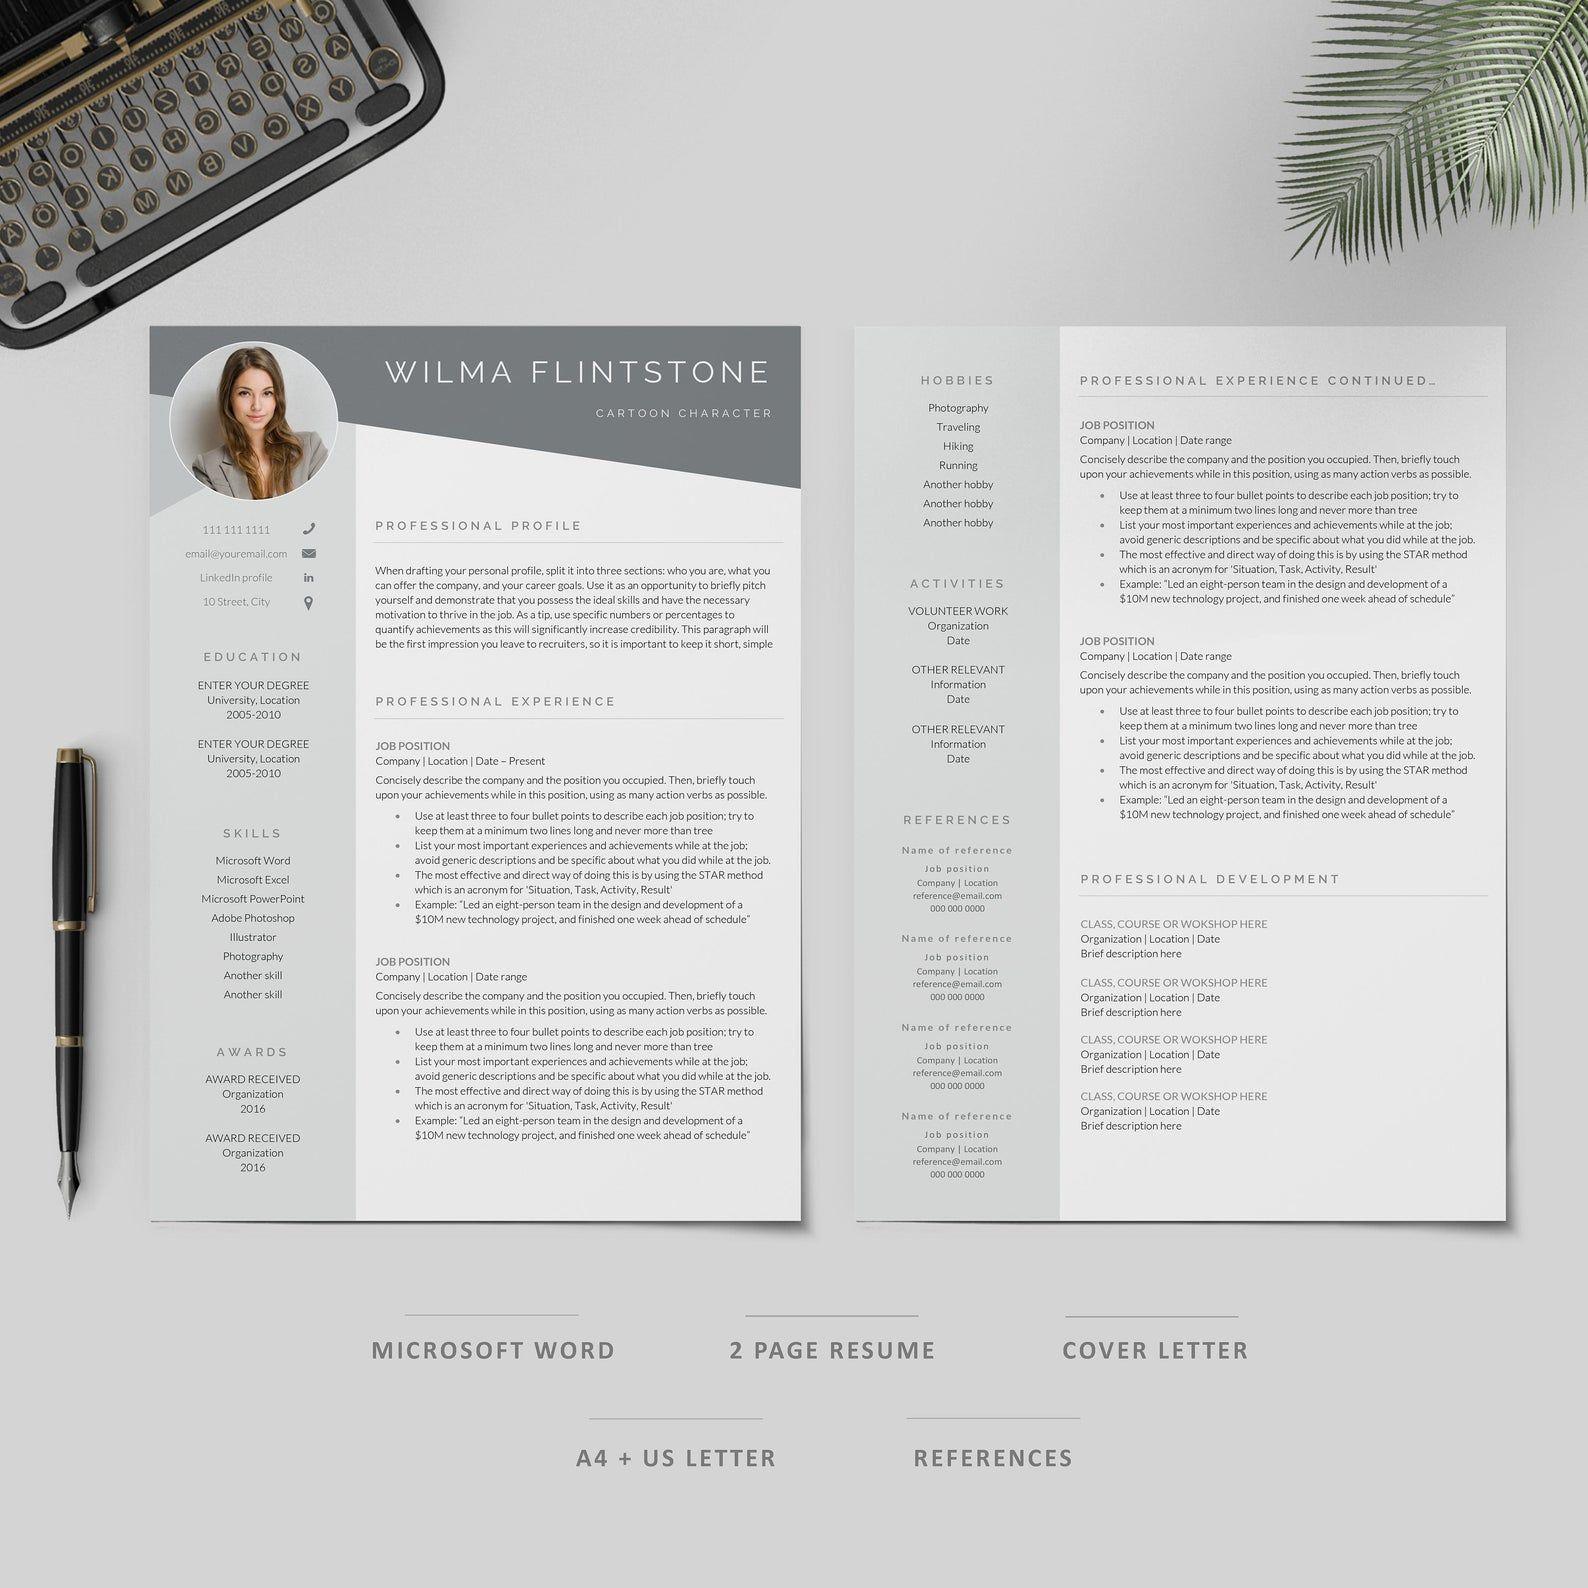 Resume Template Professional Resume Cv Template Modern Resume Resume Resume Template Word Creative Resume Cv Resume Design Resume Template Professional Resume Template Word Resume Template